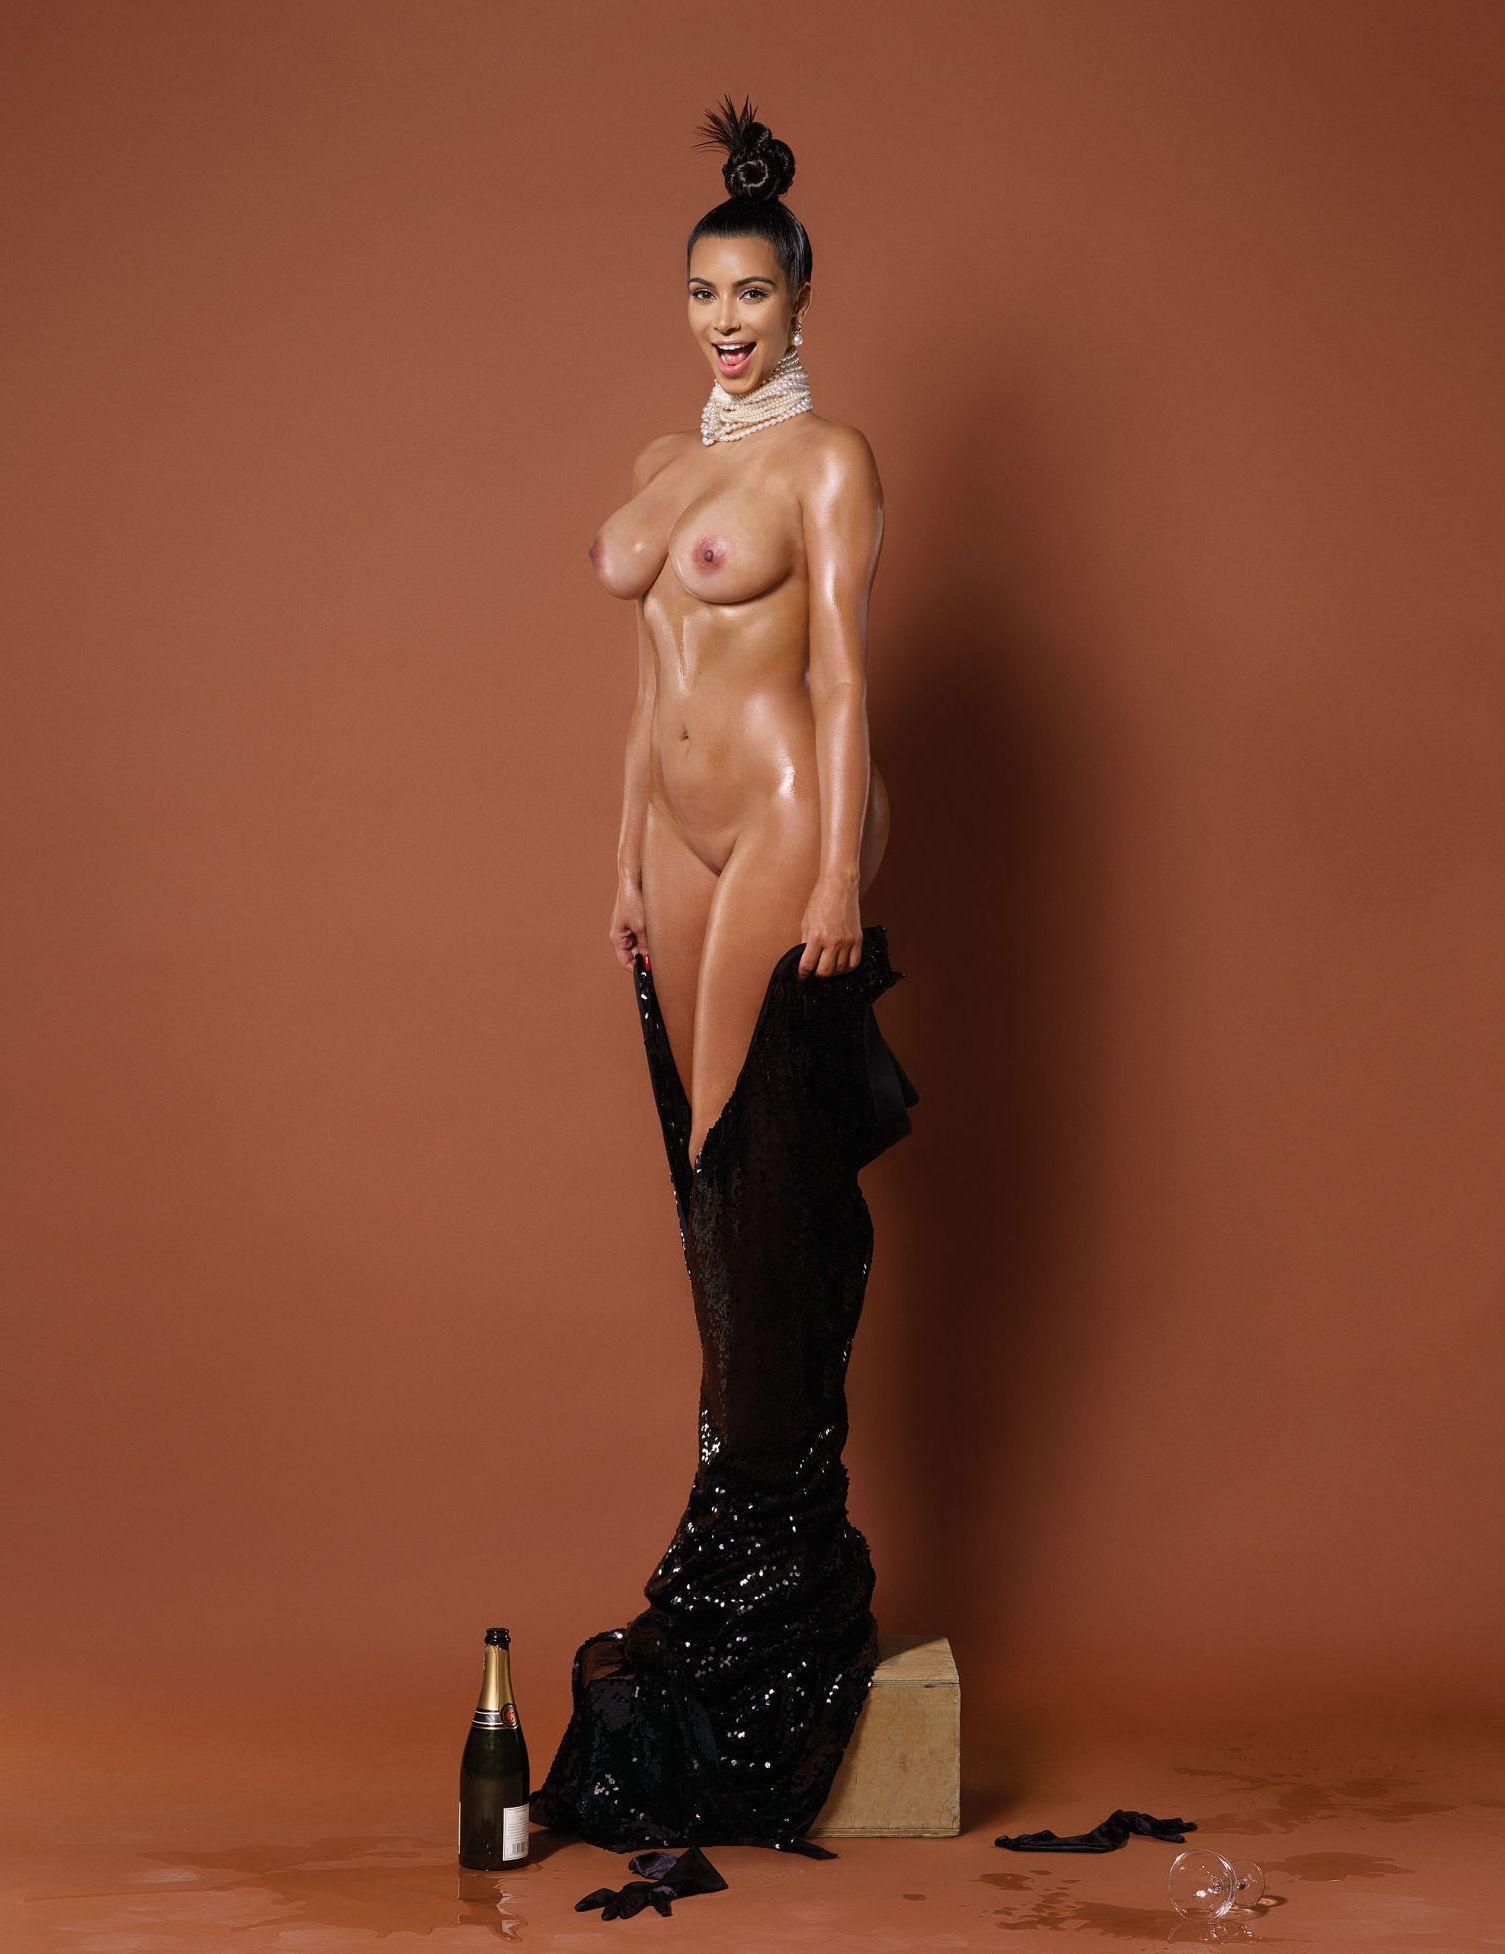 Naked pics of kim kardashian — photo 8